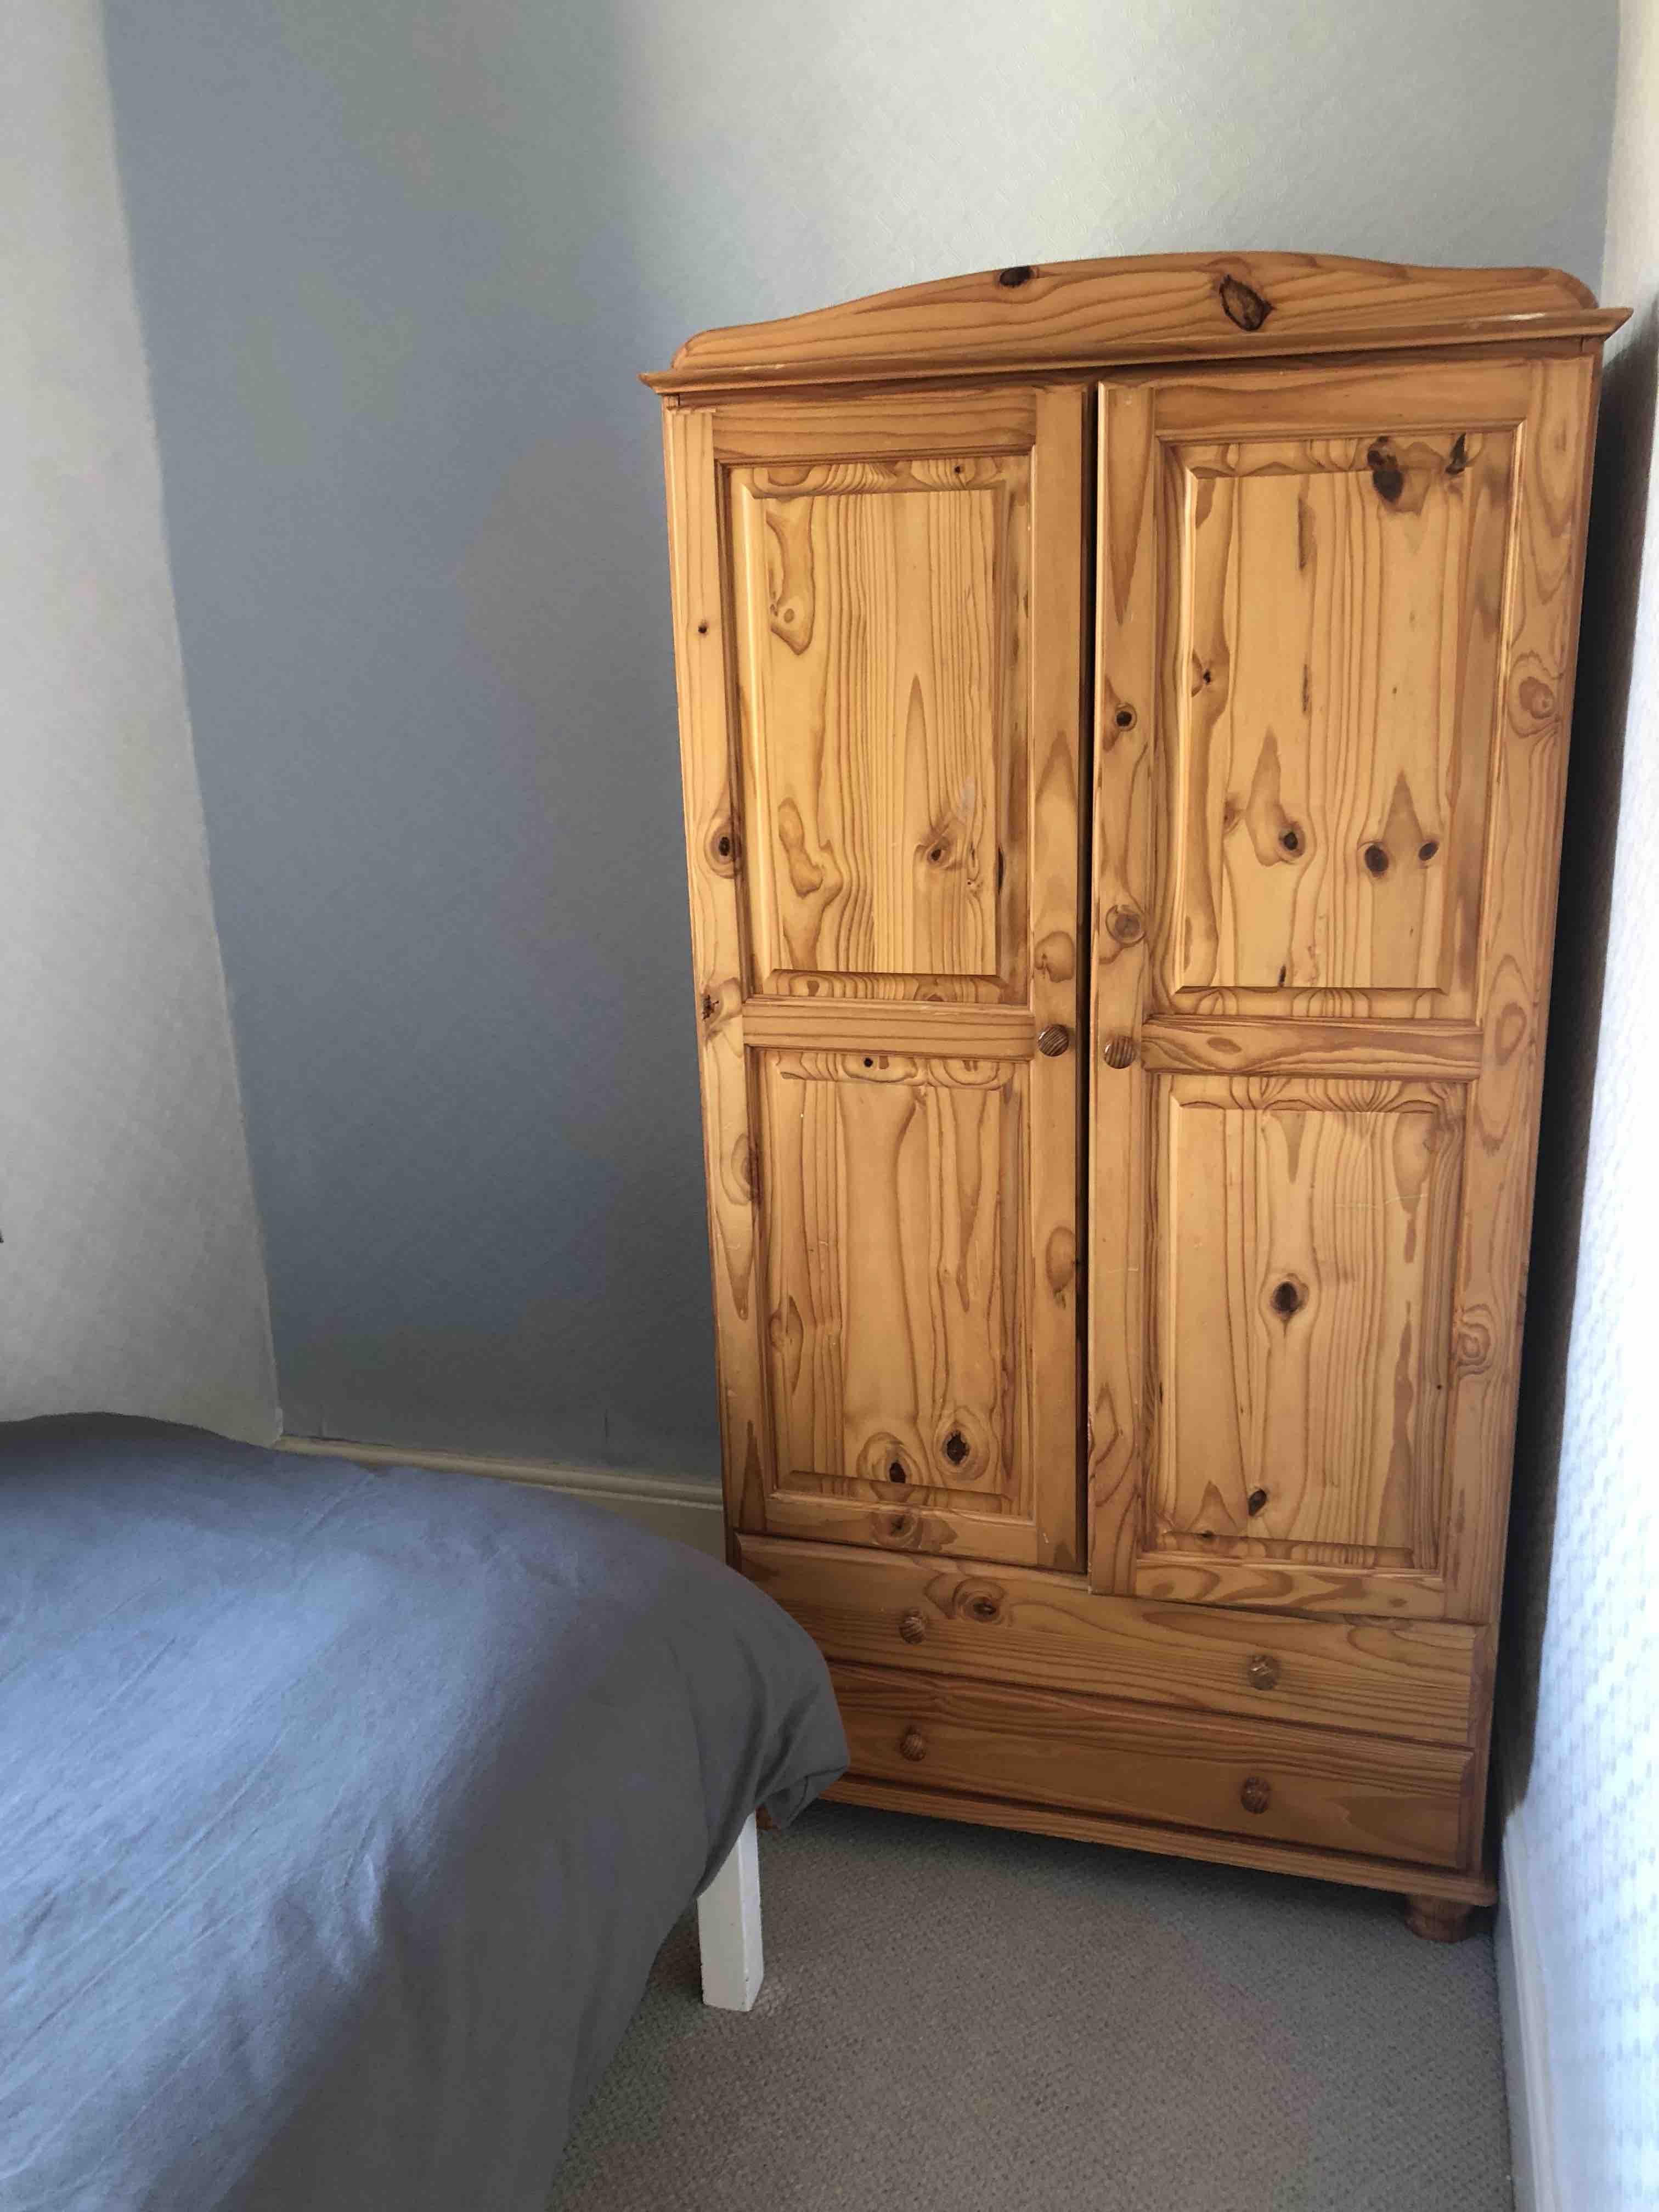 2 rooms in Newport, Newport, NP20 5RA RoomsLocal image